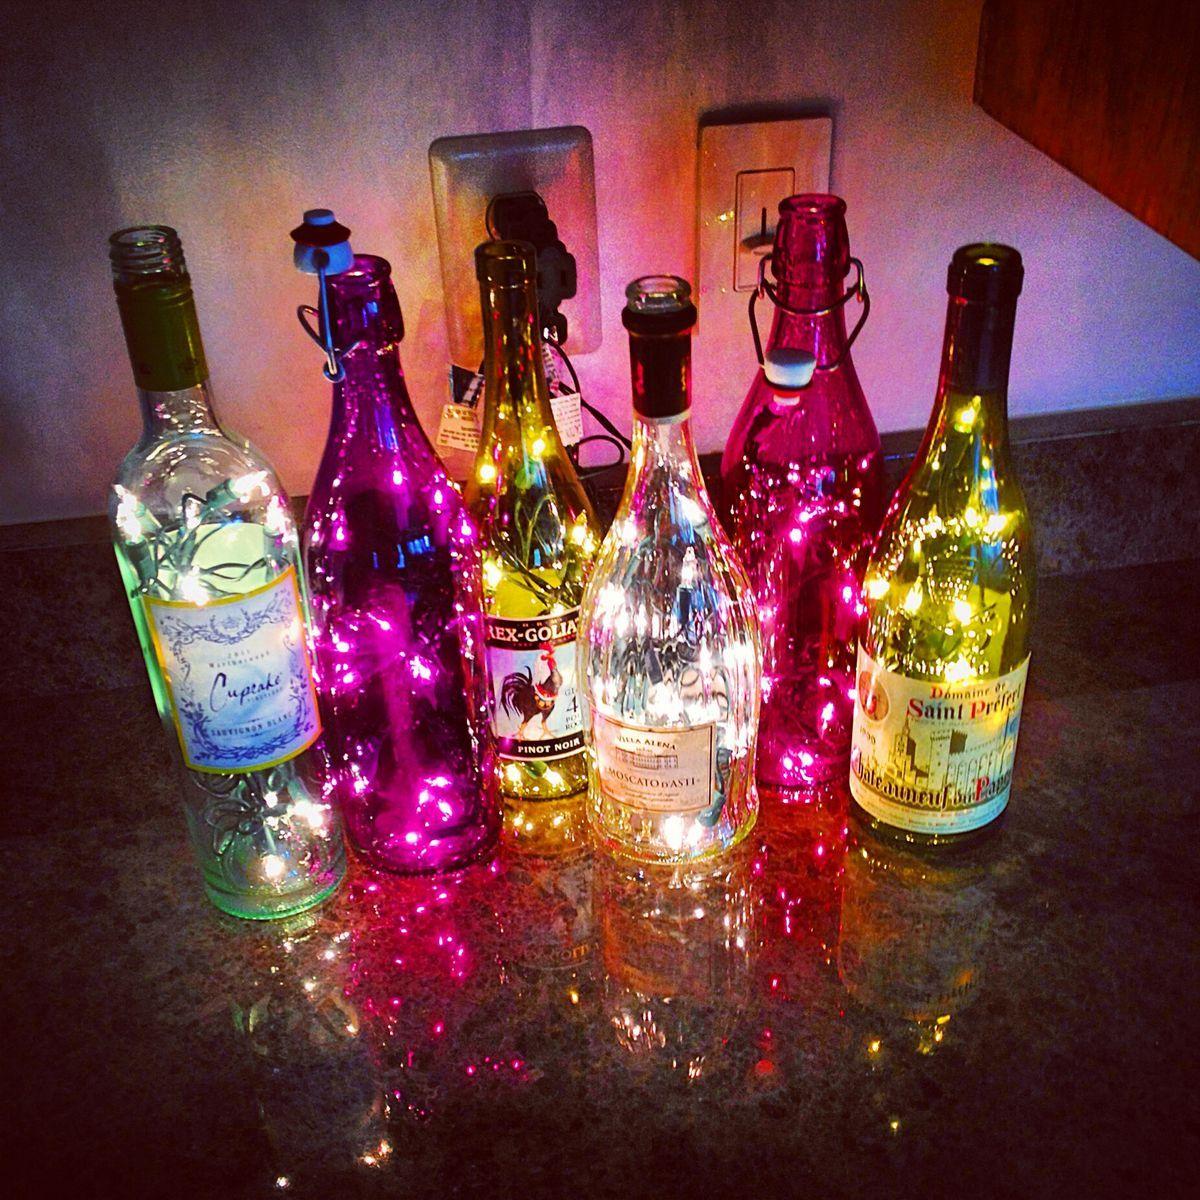 869fb053be2fa6c49f42aeba086a728e Jpg 1 200 1 200 Pixels Wine Bottle Diy Wine Bottle Crafts Wine Bottle Art